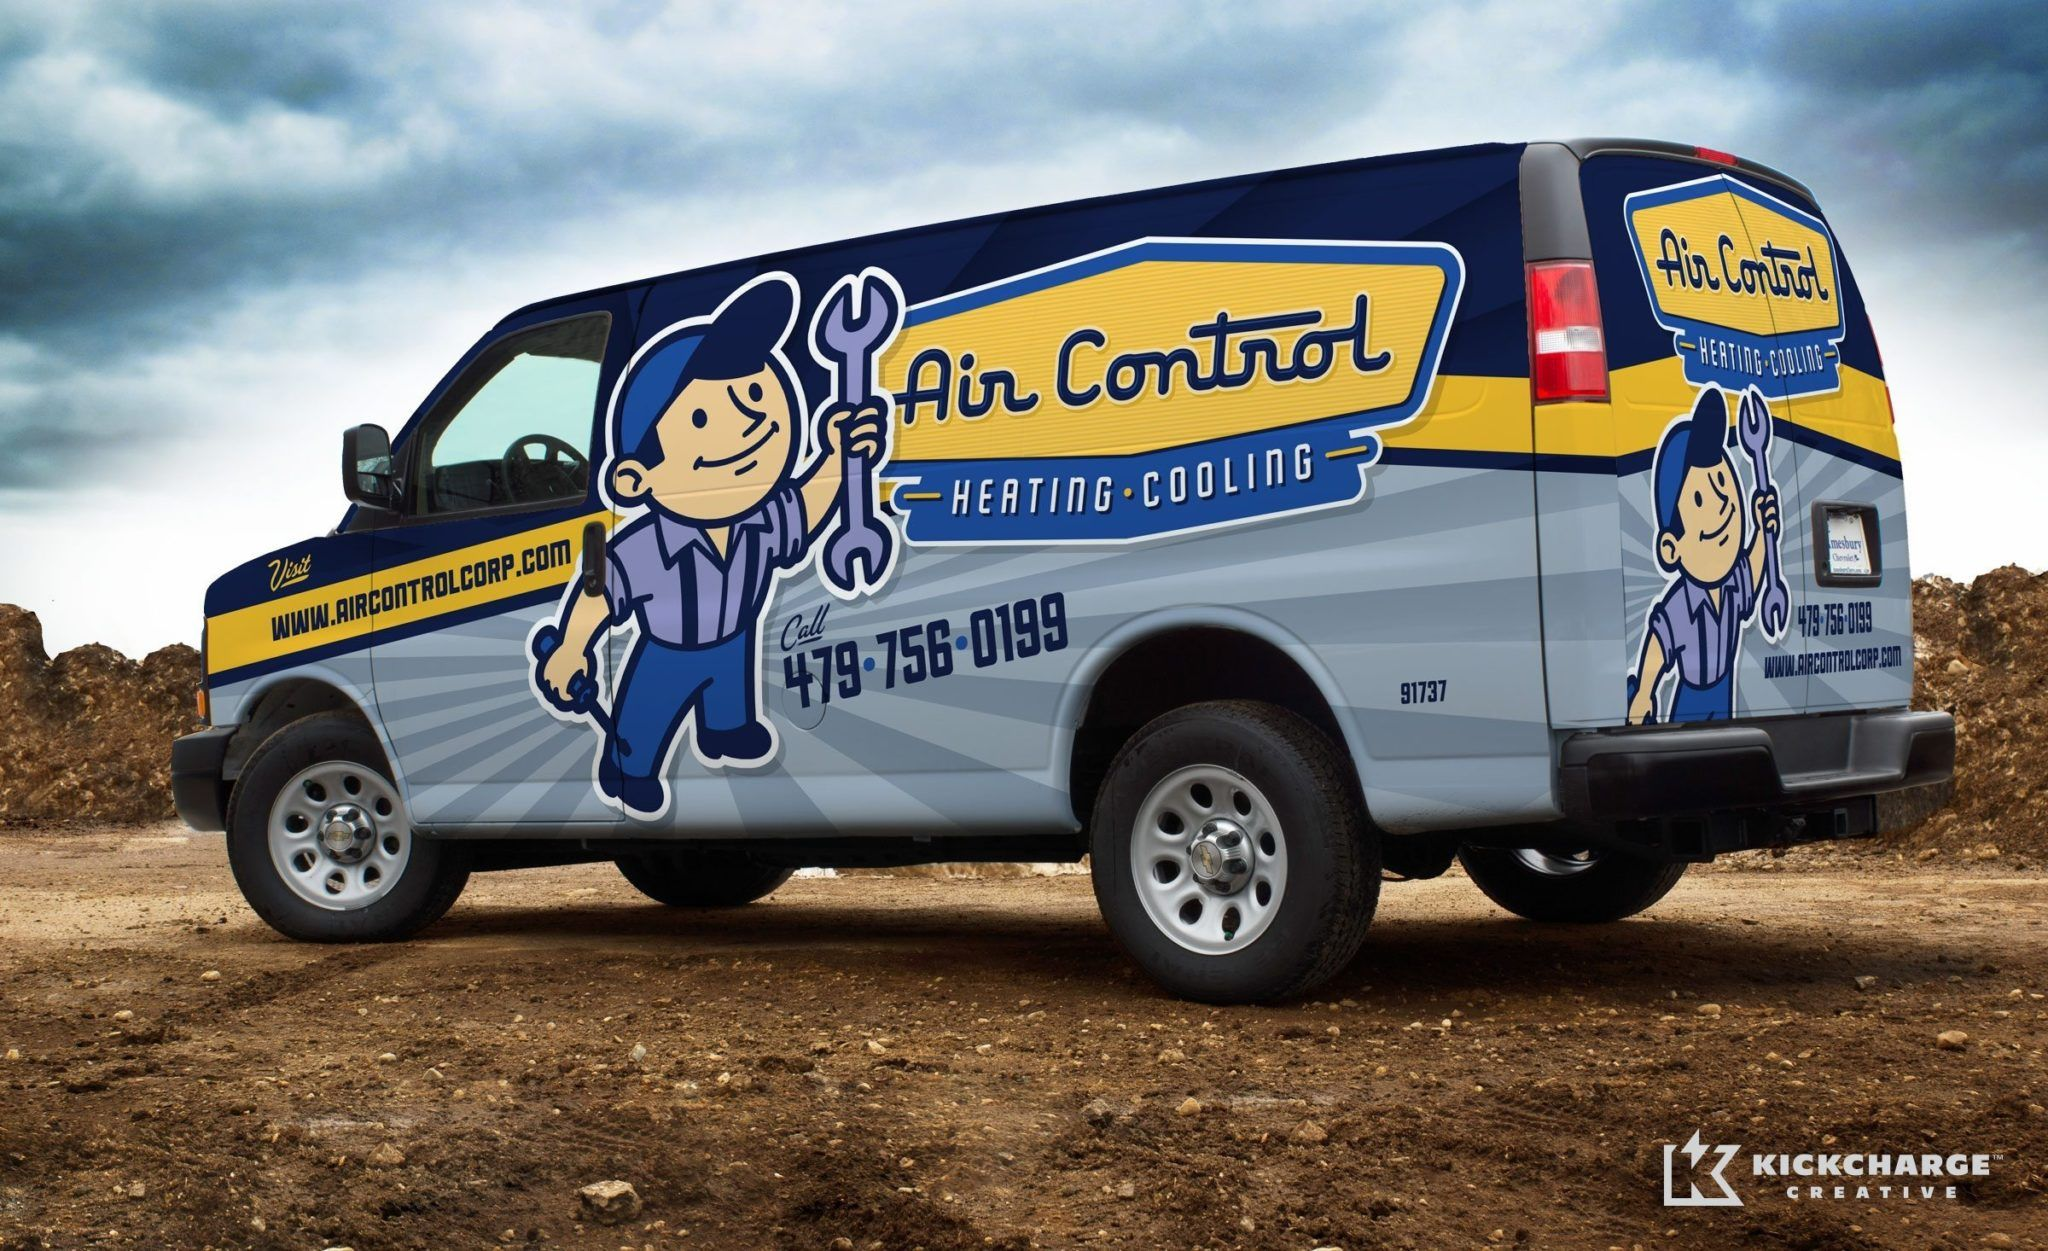 Air Control Heating Cooling Kickcharge Creative Cool Trucks